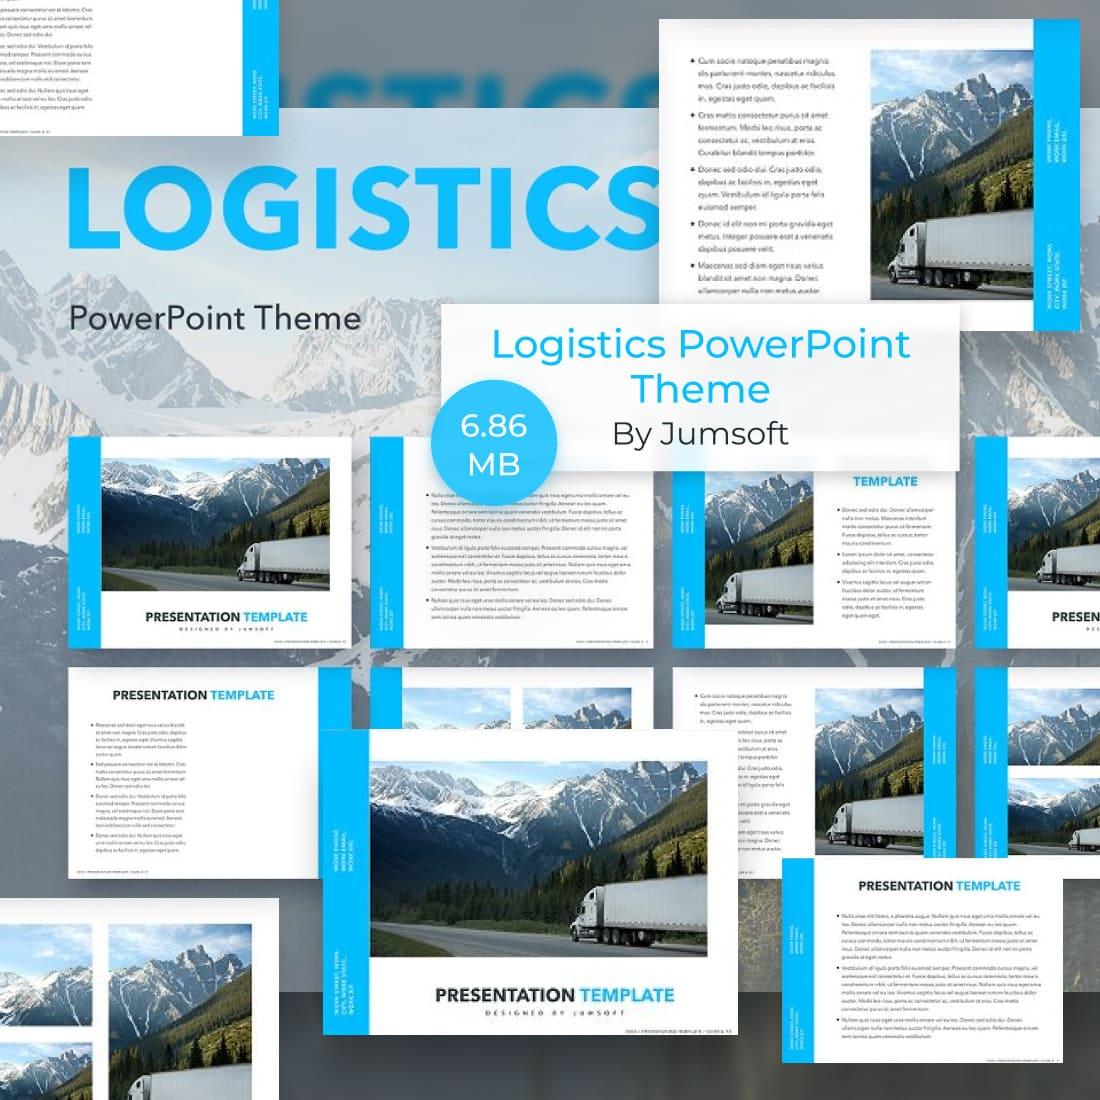 01 Logistics PowerPoint Theme 1100x1100 1